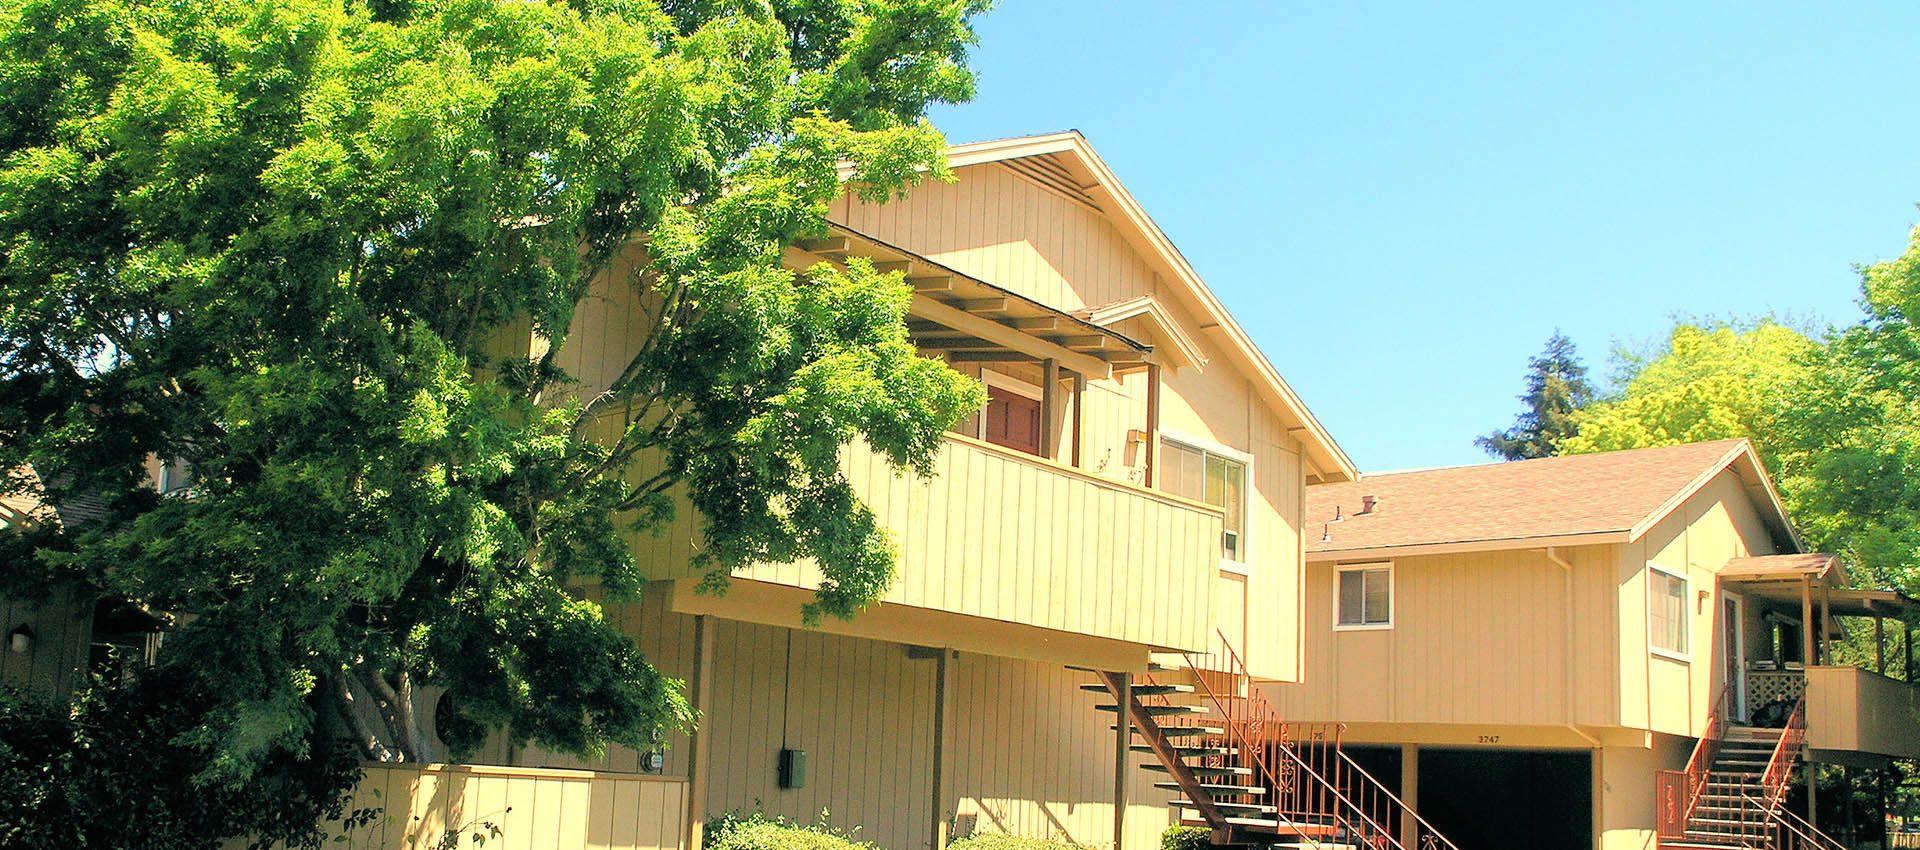 Spring Lake Apartment Homes in Santa Rosa, CA